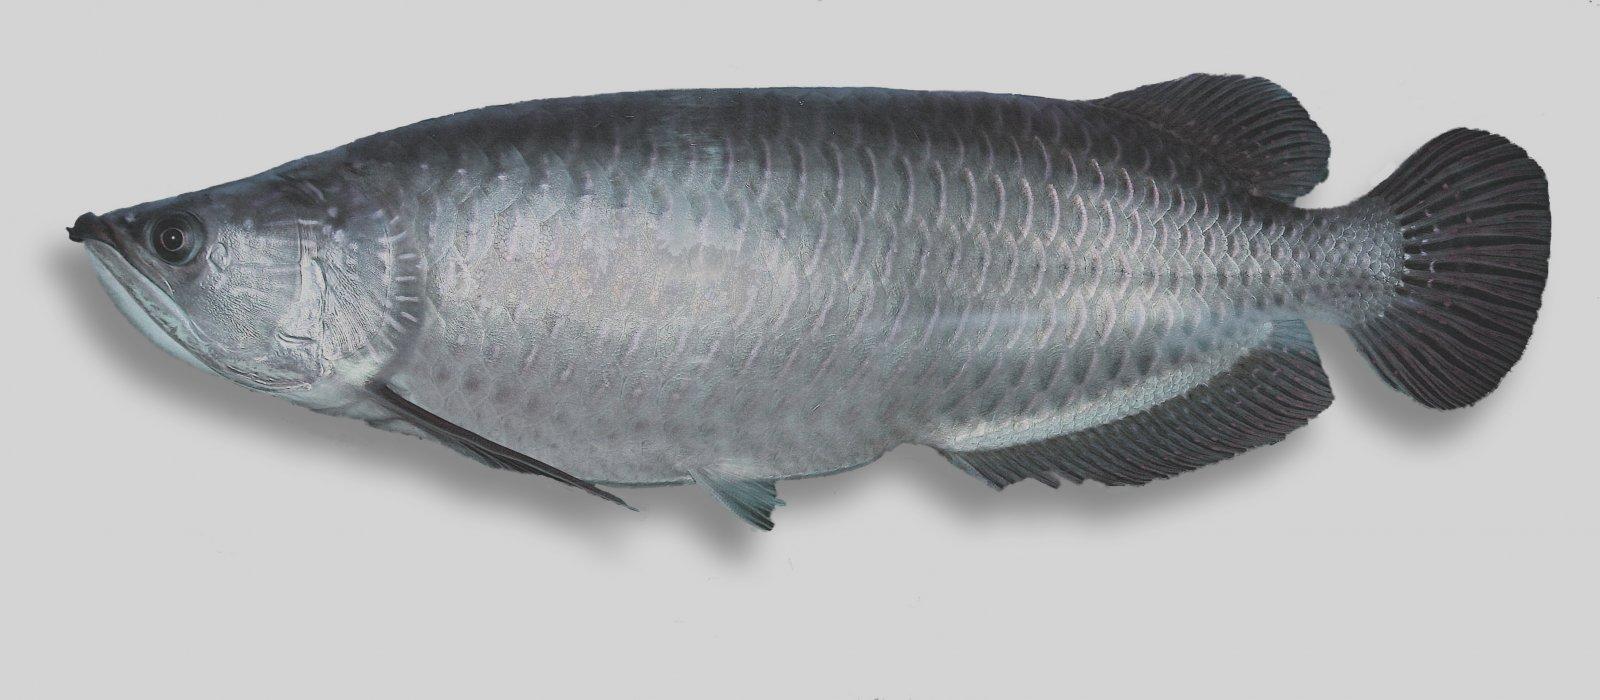 Fish Identification | Suntag